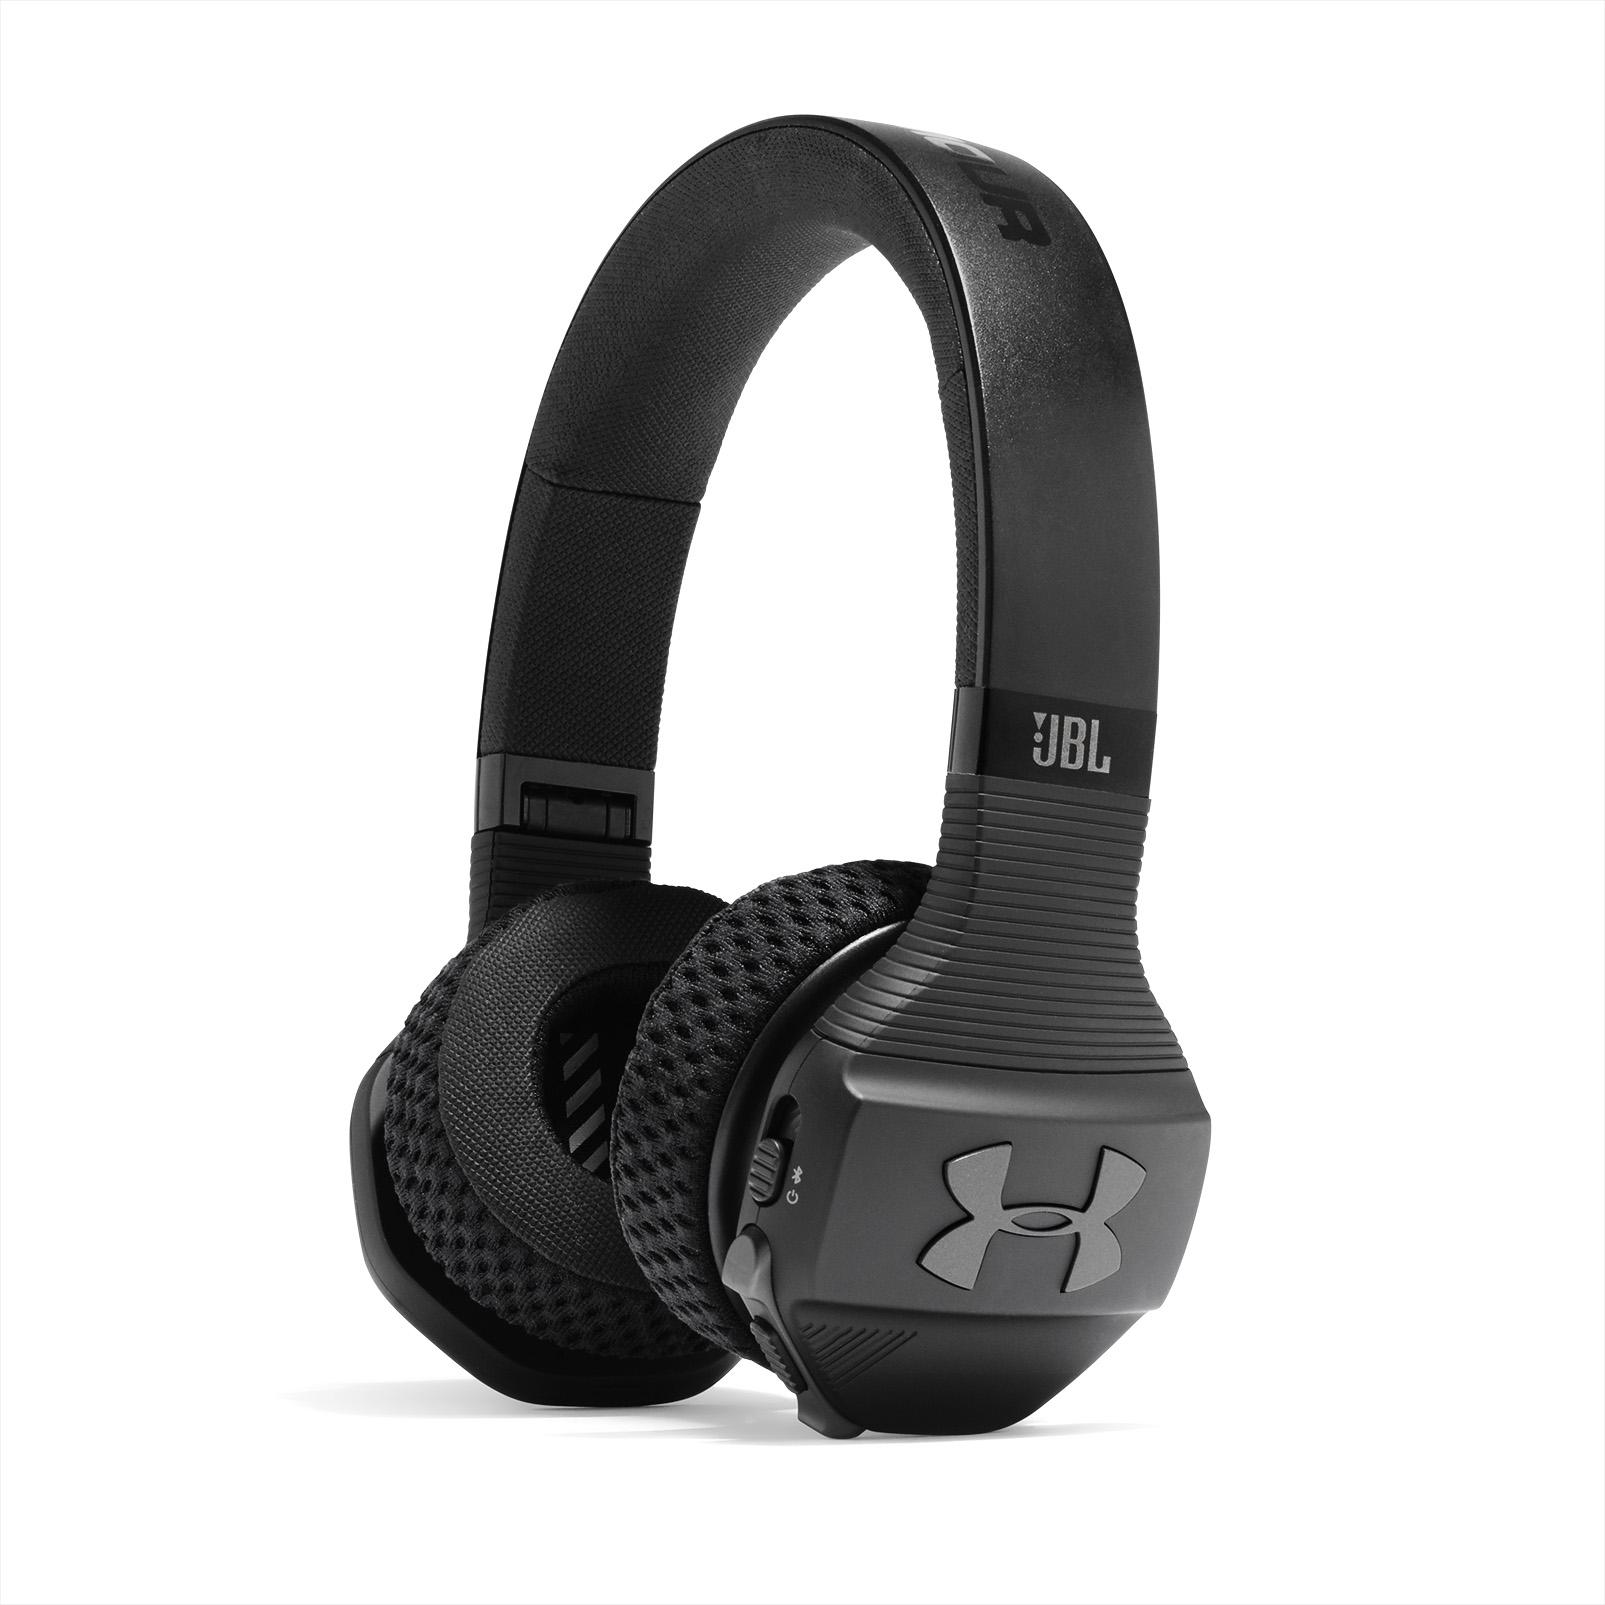 Under Armour JBL Train On-Ear Wireless Headphones - Black